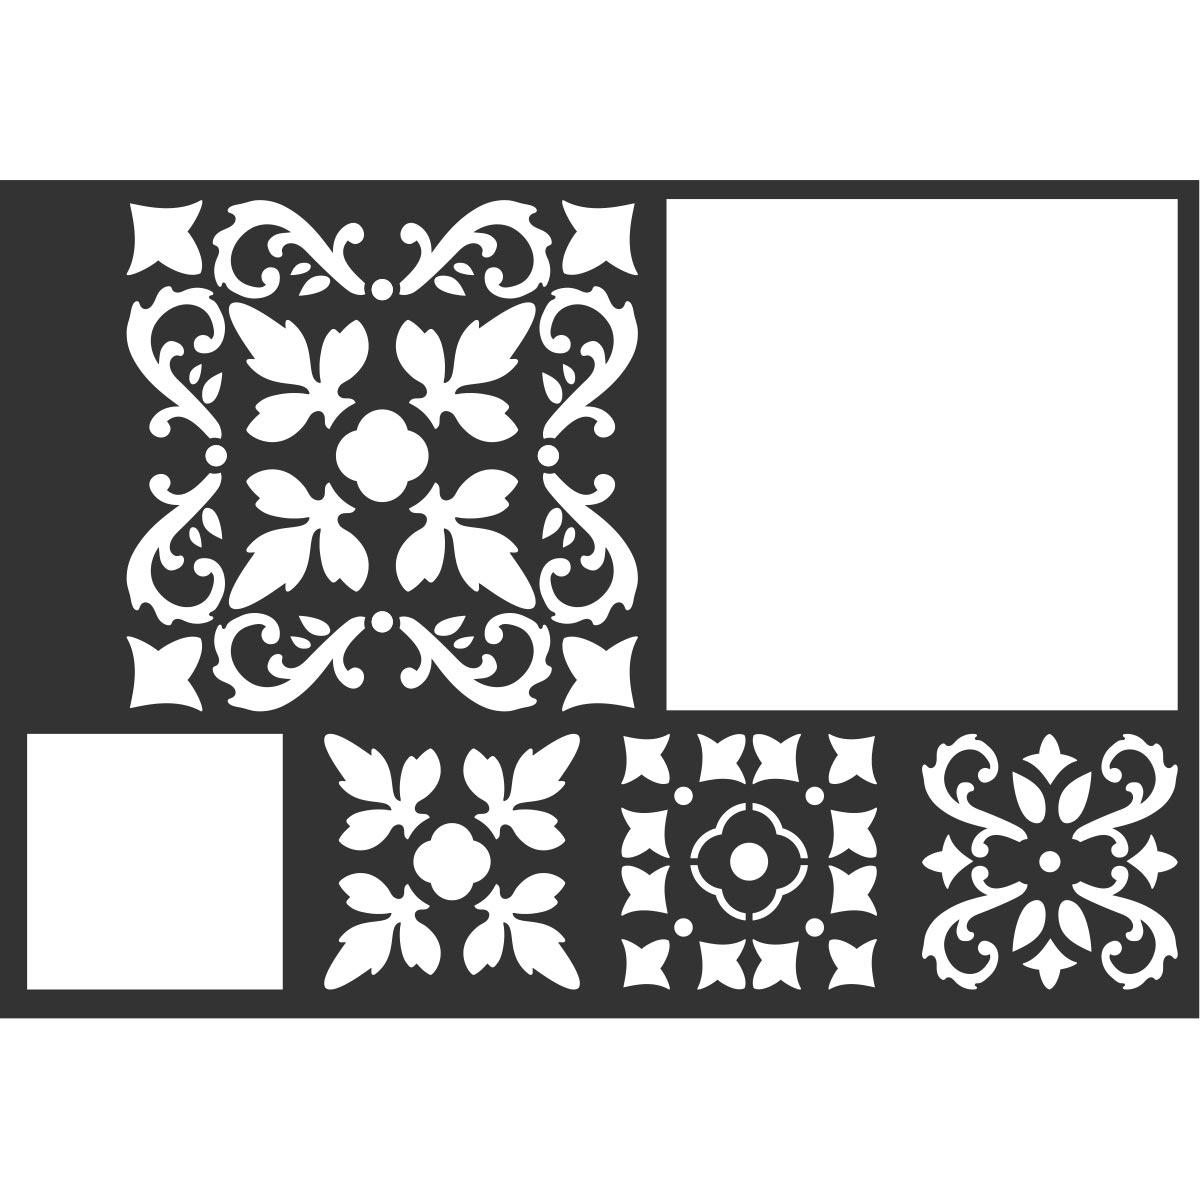 FolkArt ® Painting Stencils - Barcelona Tile - 25608